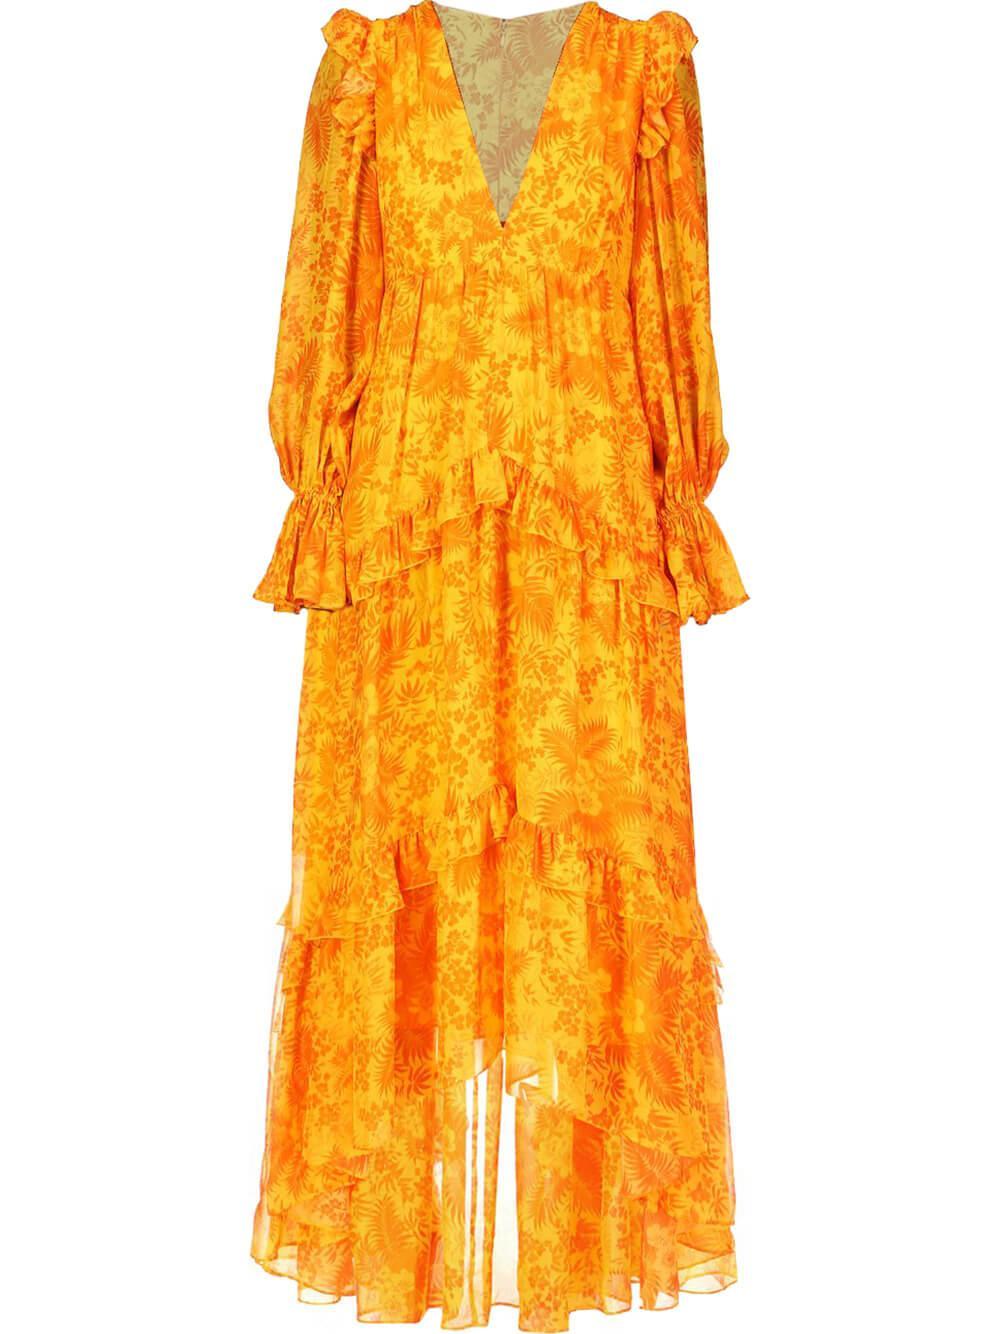 Allegra Maxi Dress Item # 5814612